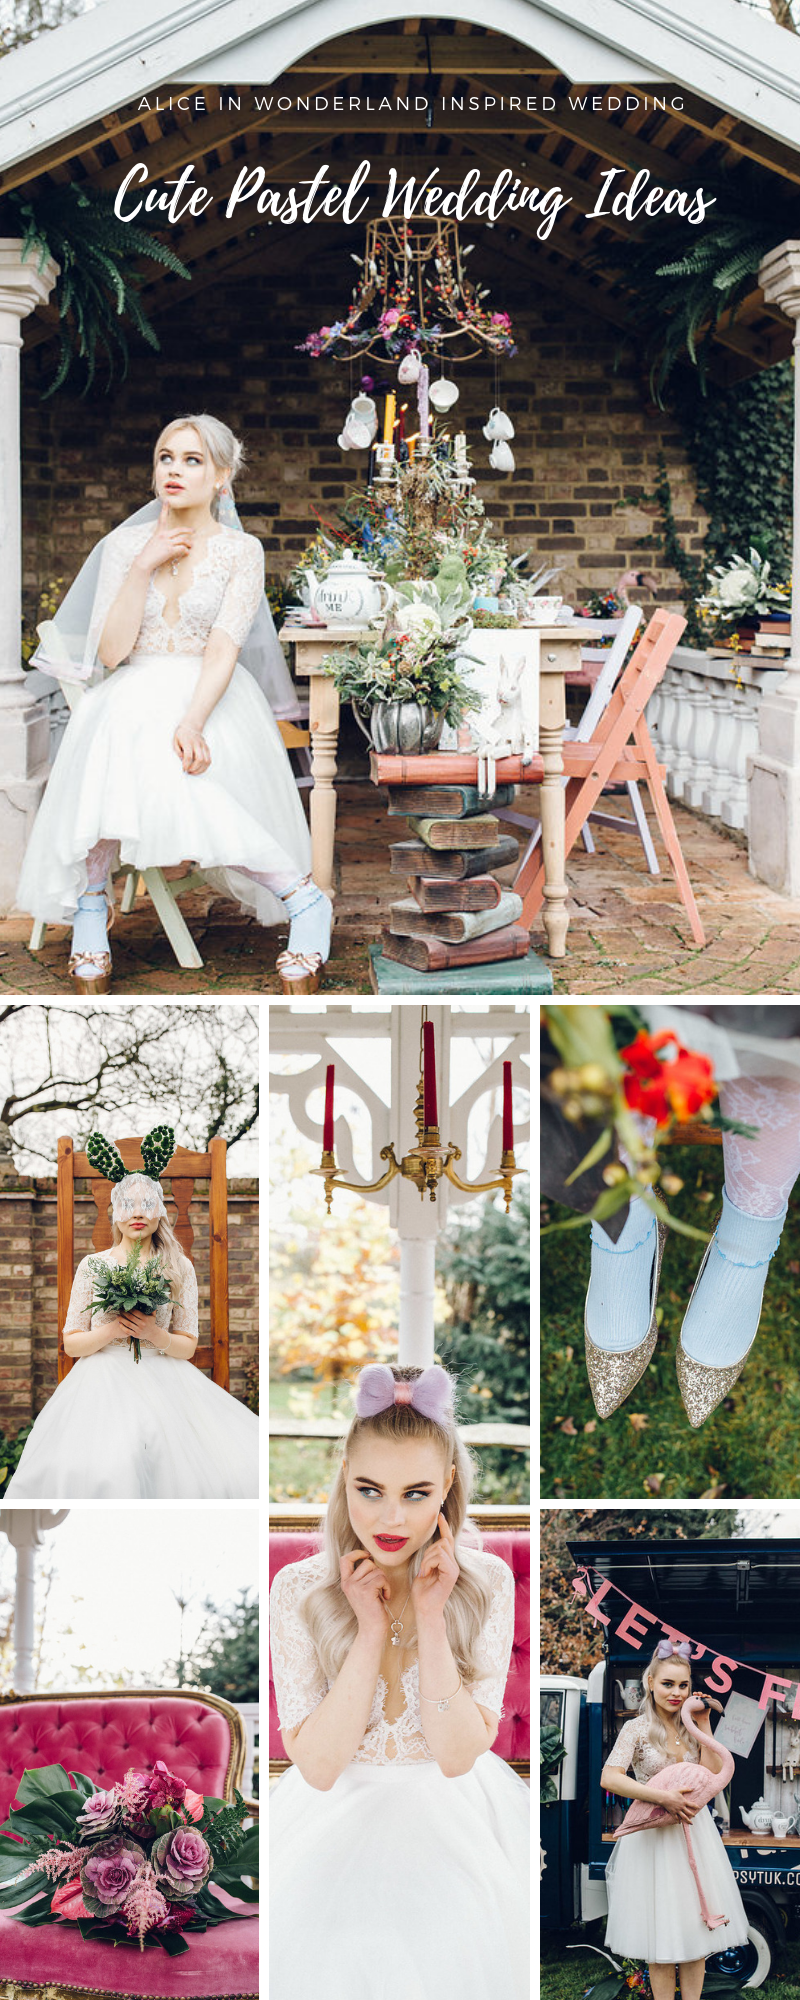 Alice in Wonderland Inspired Wedding Ideas Marley Brook House Cute Pastel Wedding